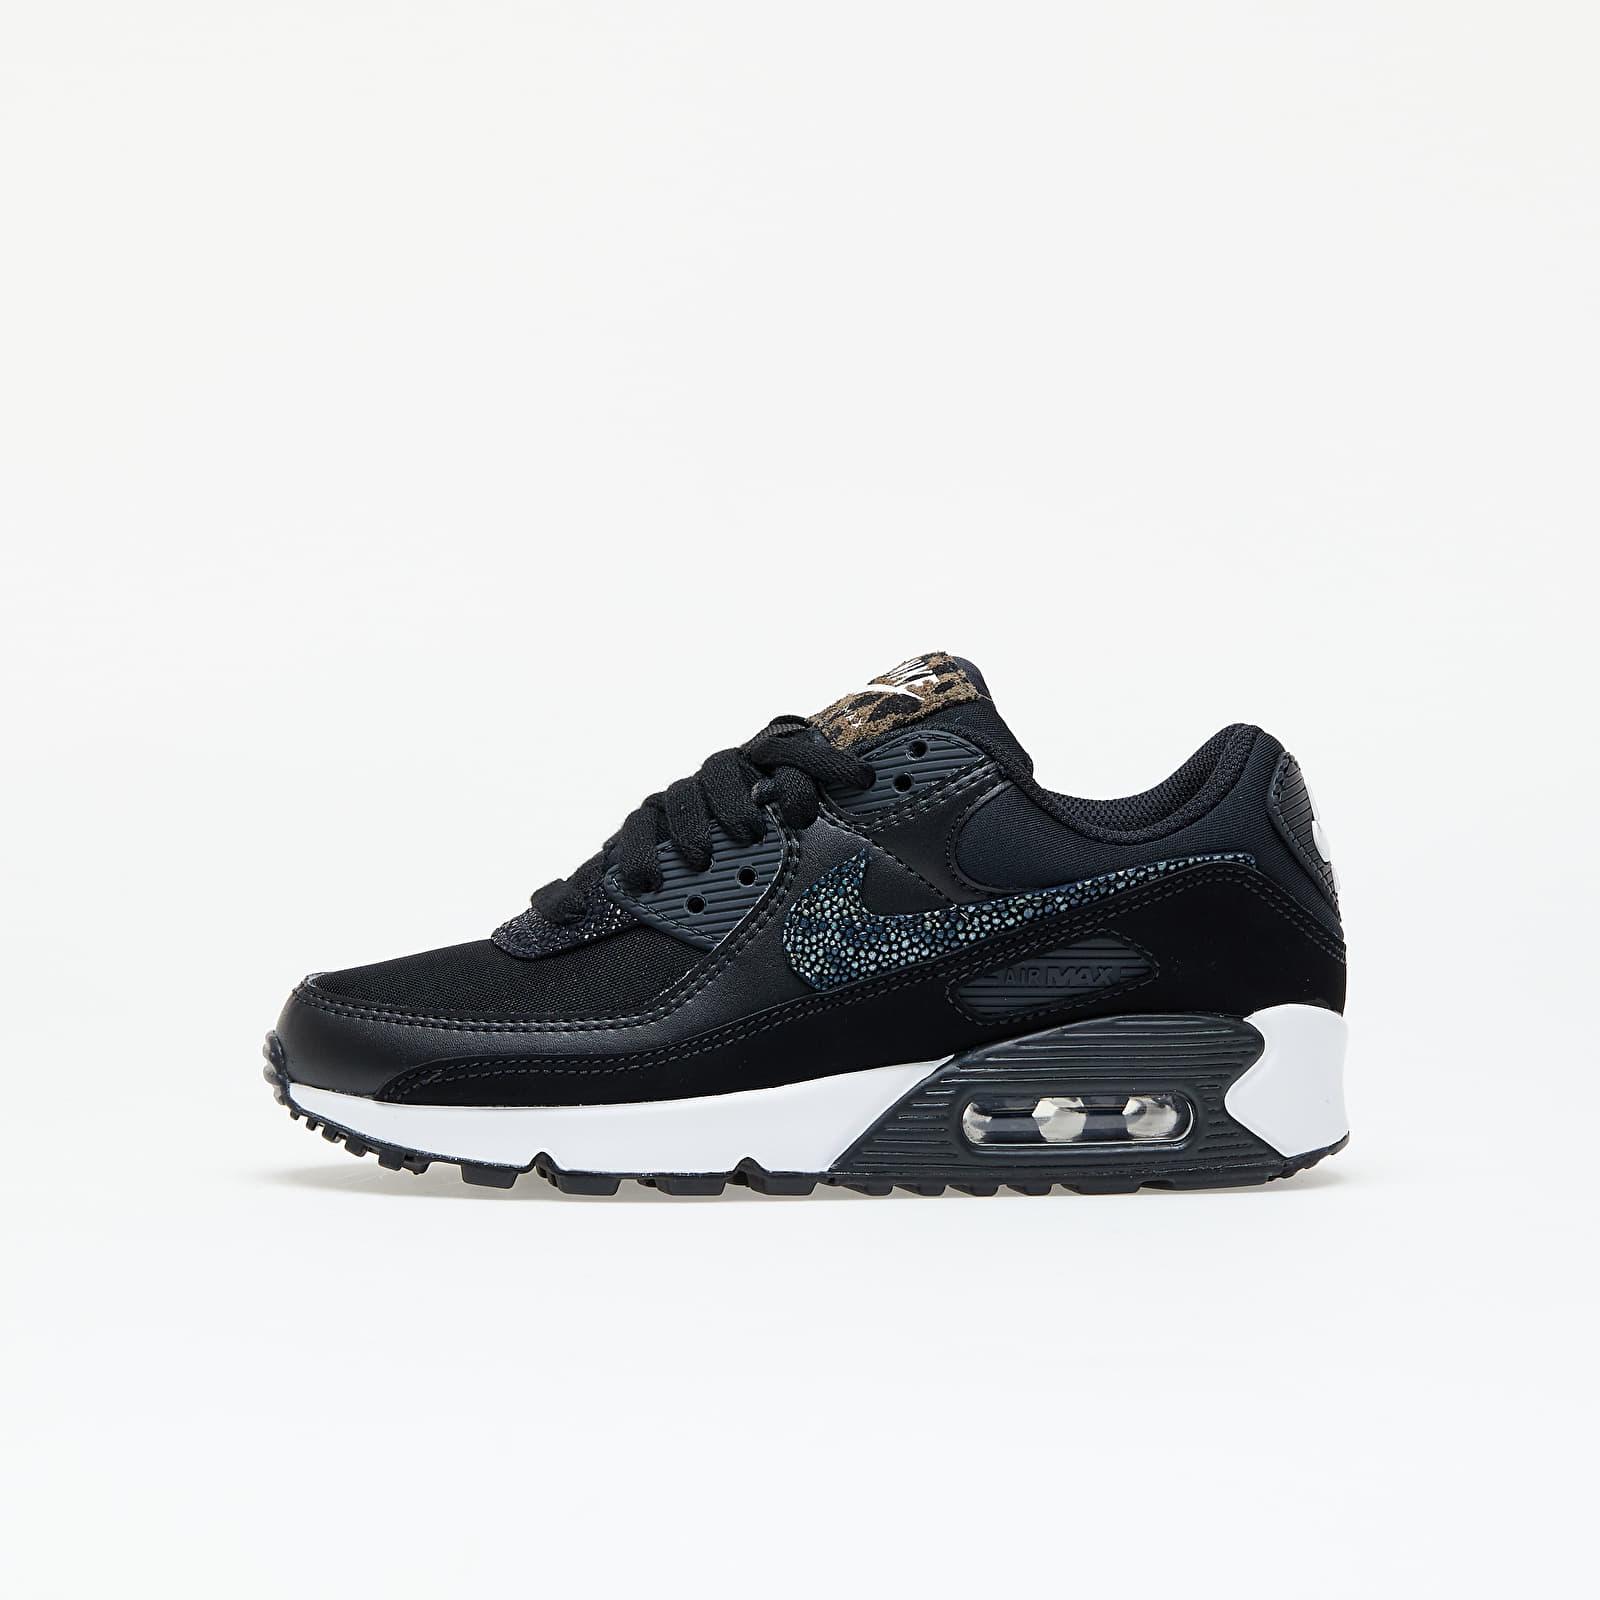 Nike W Air Max 90 SE Black/ Black-Off Noir-White | Footshop